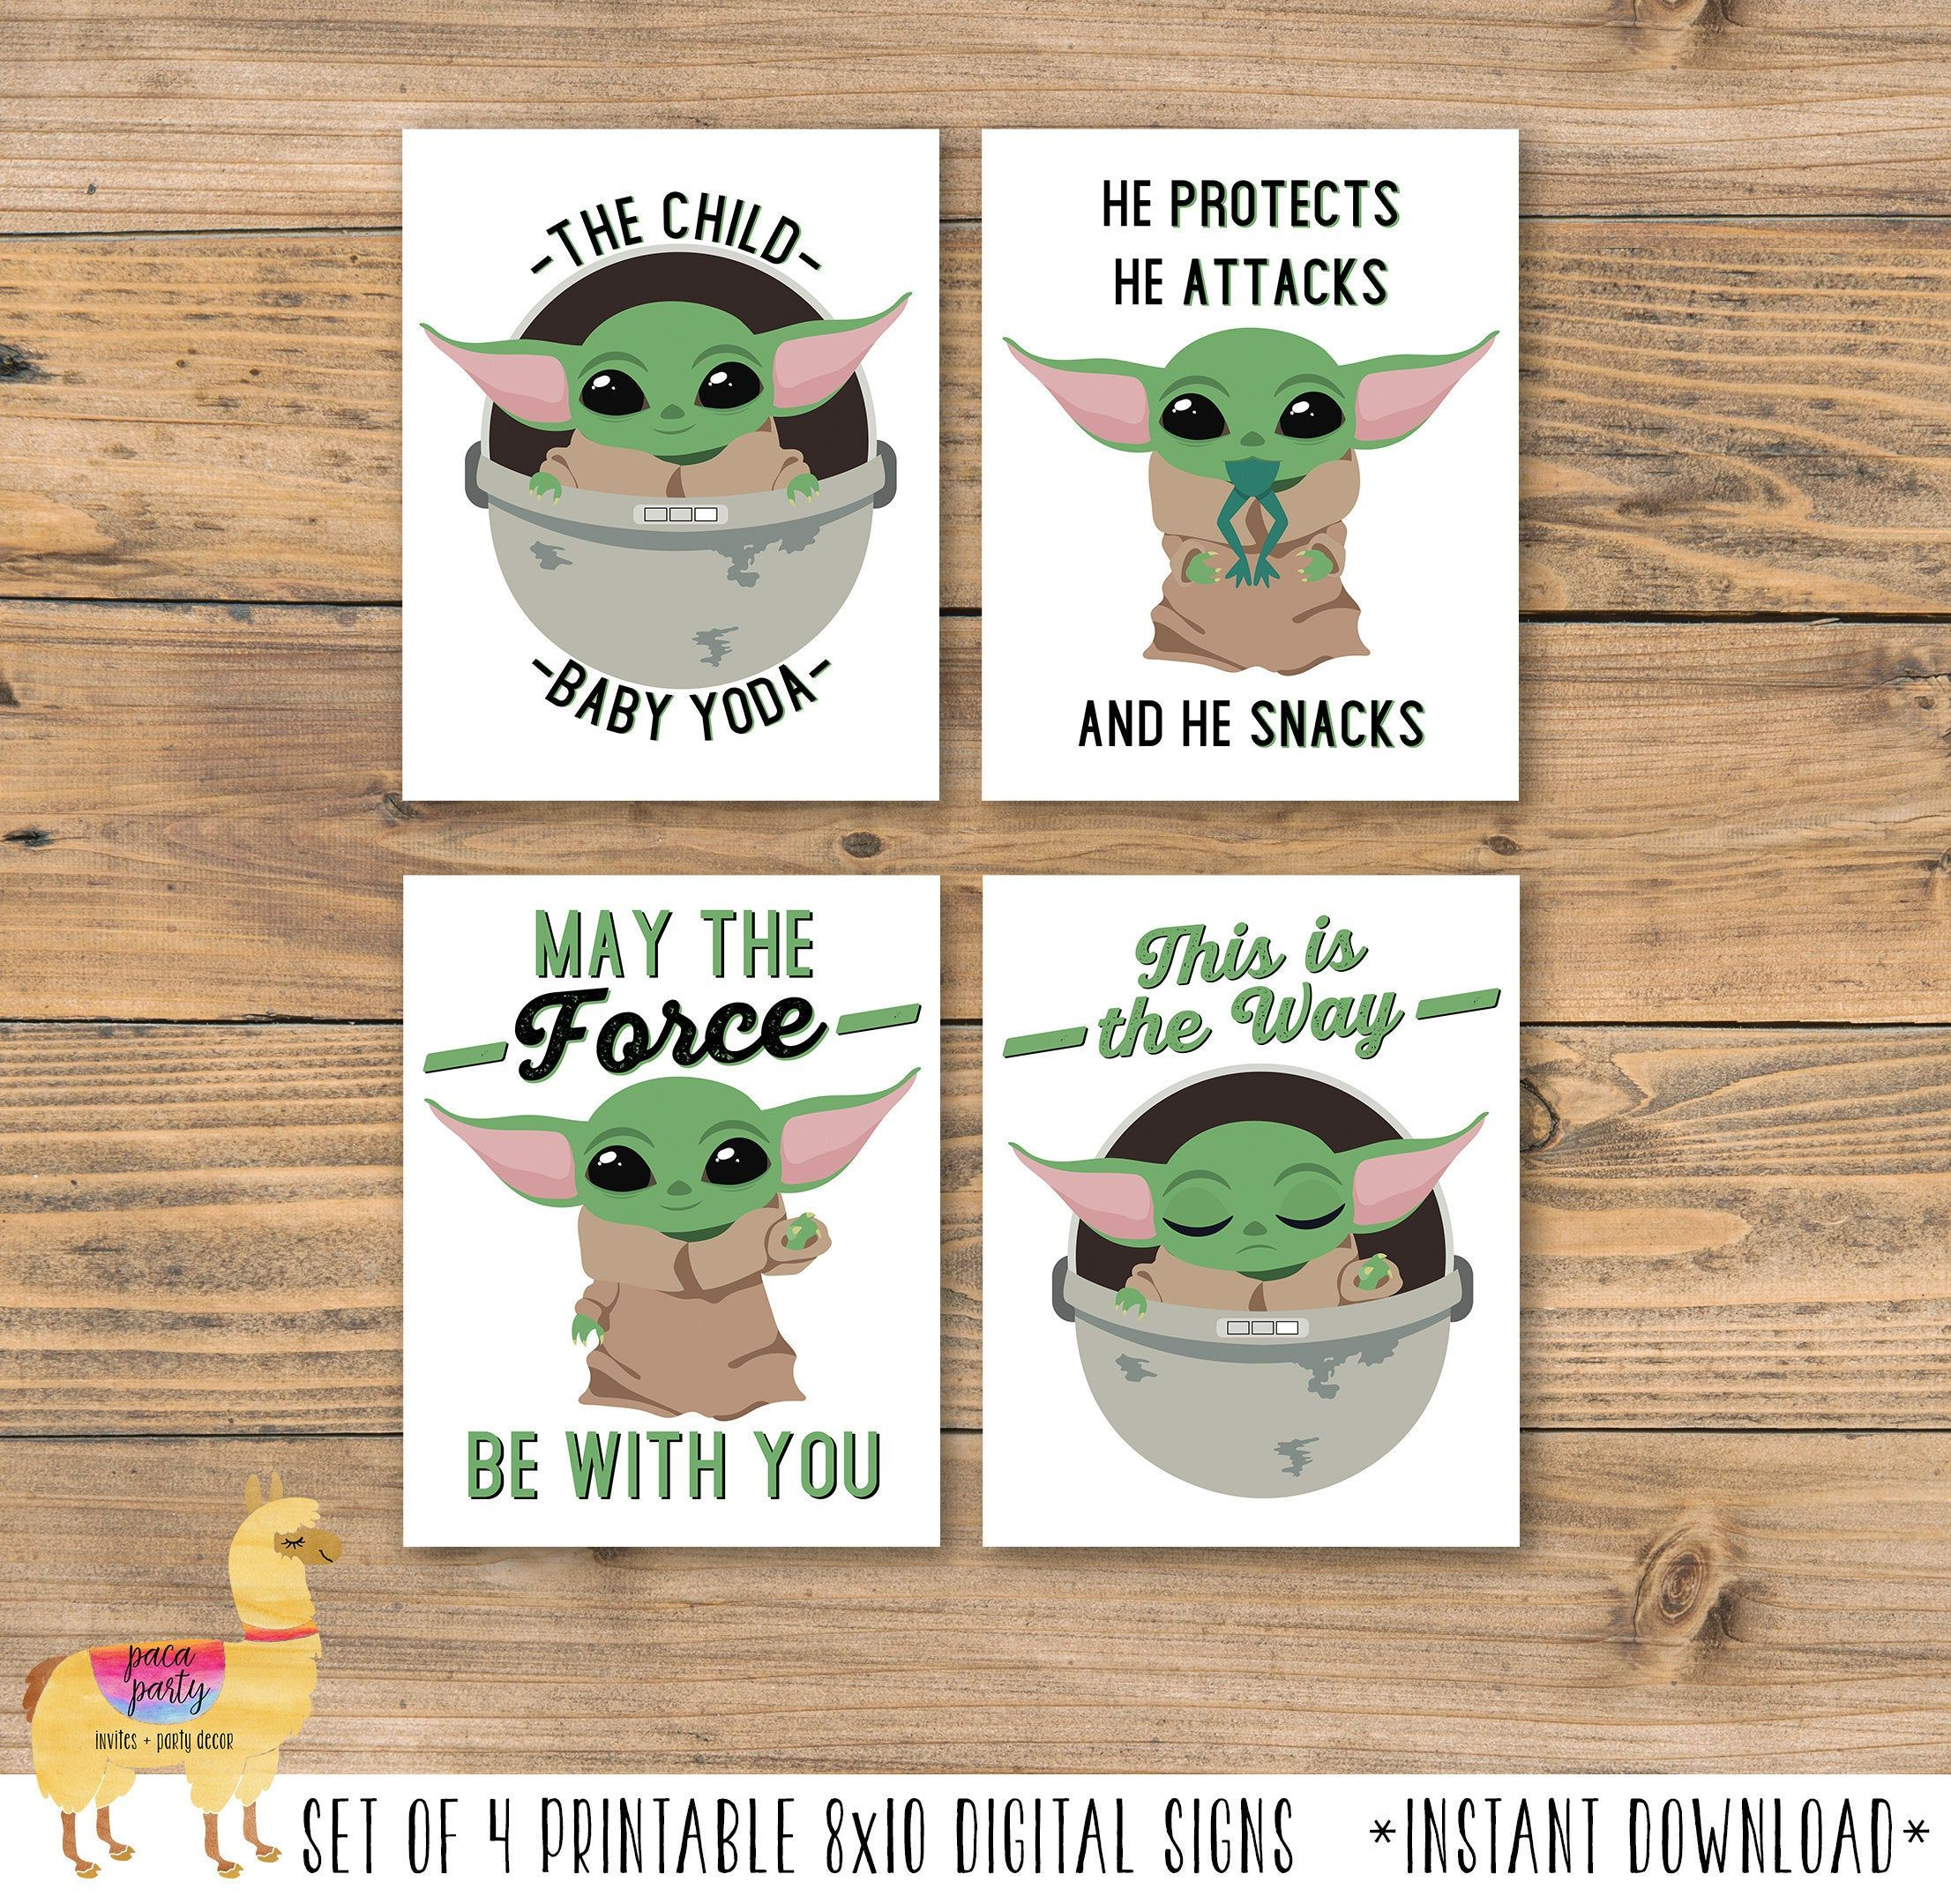 Hehehe Star Wars Humor Star Wars Memes Yoda Meme